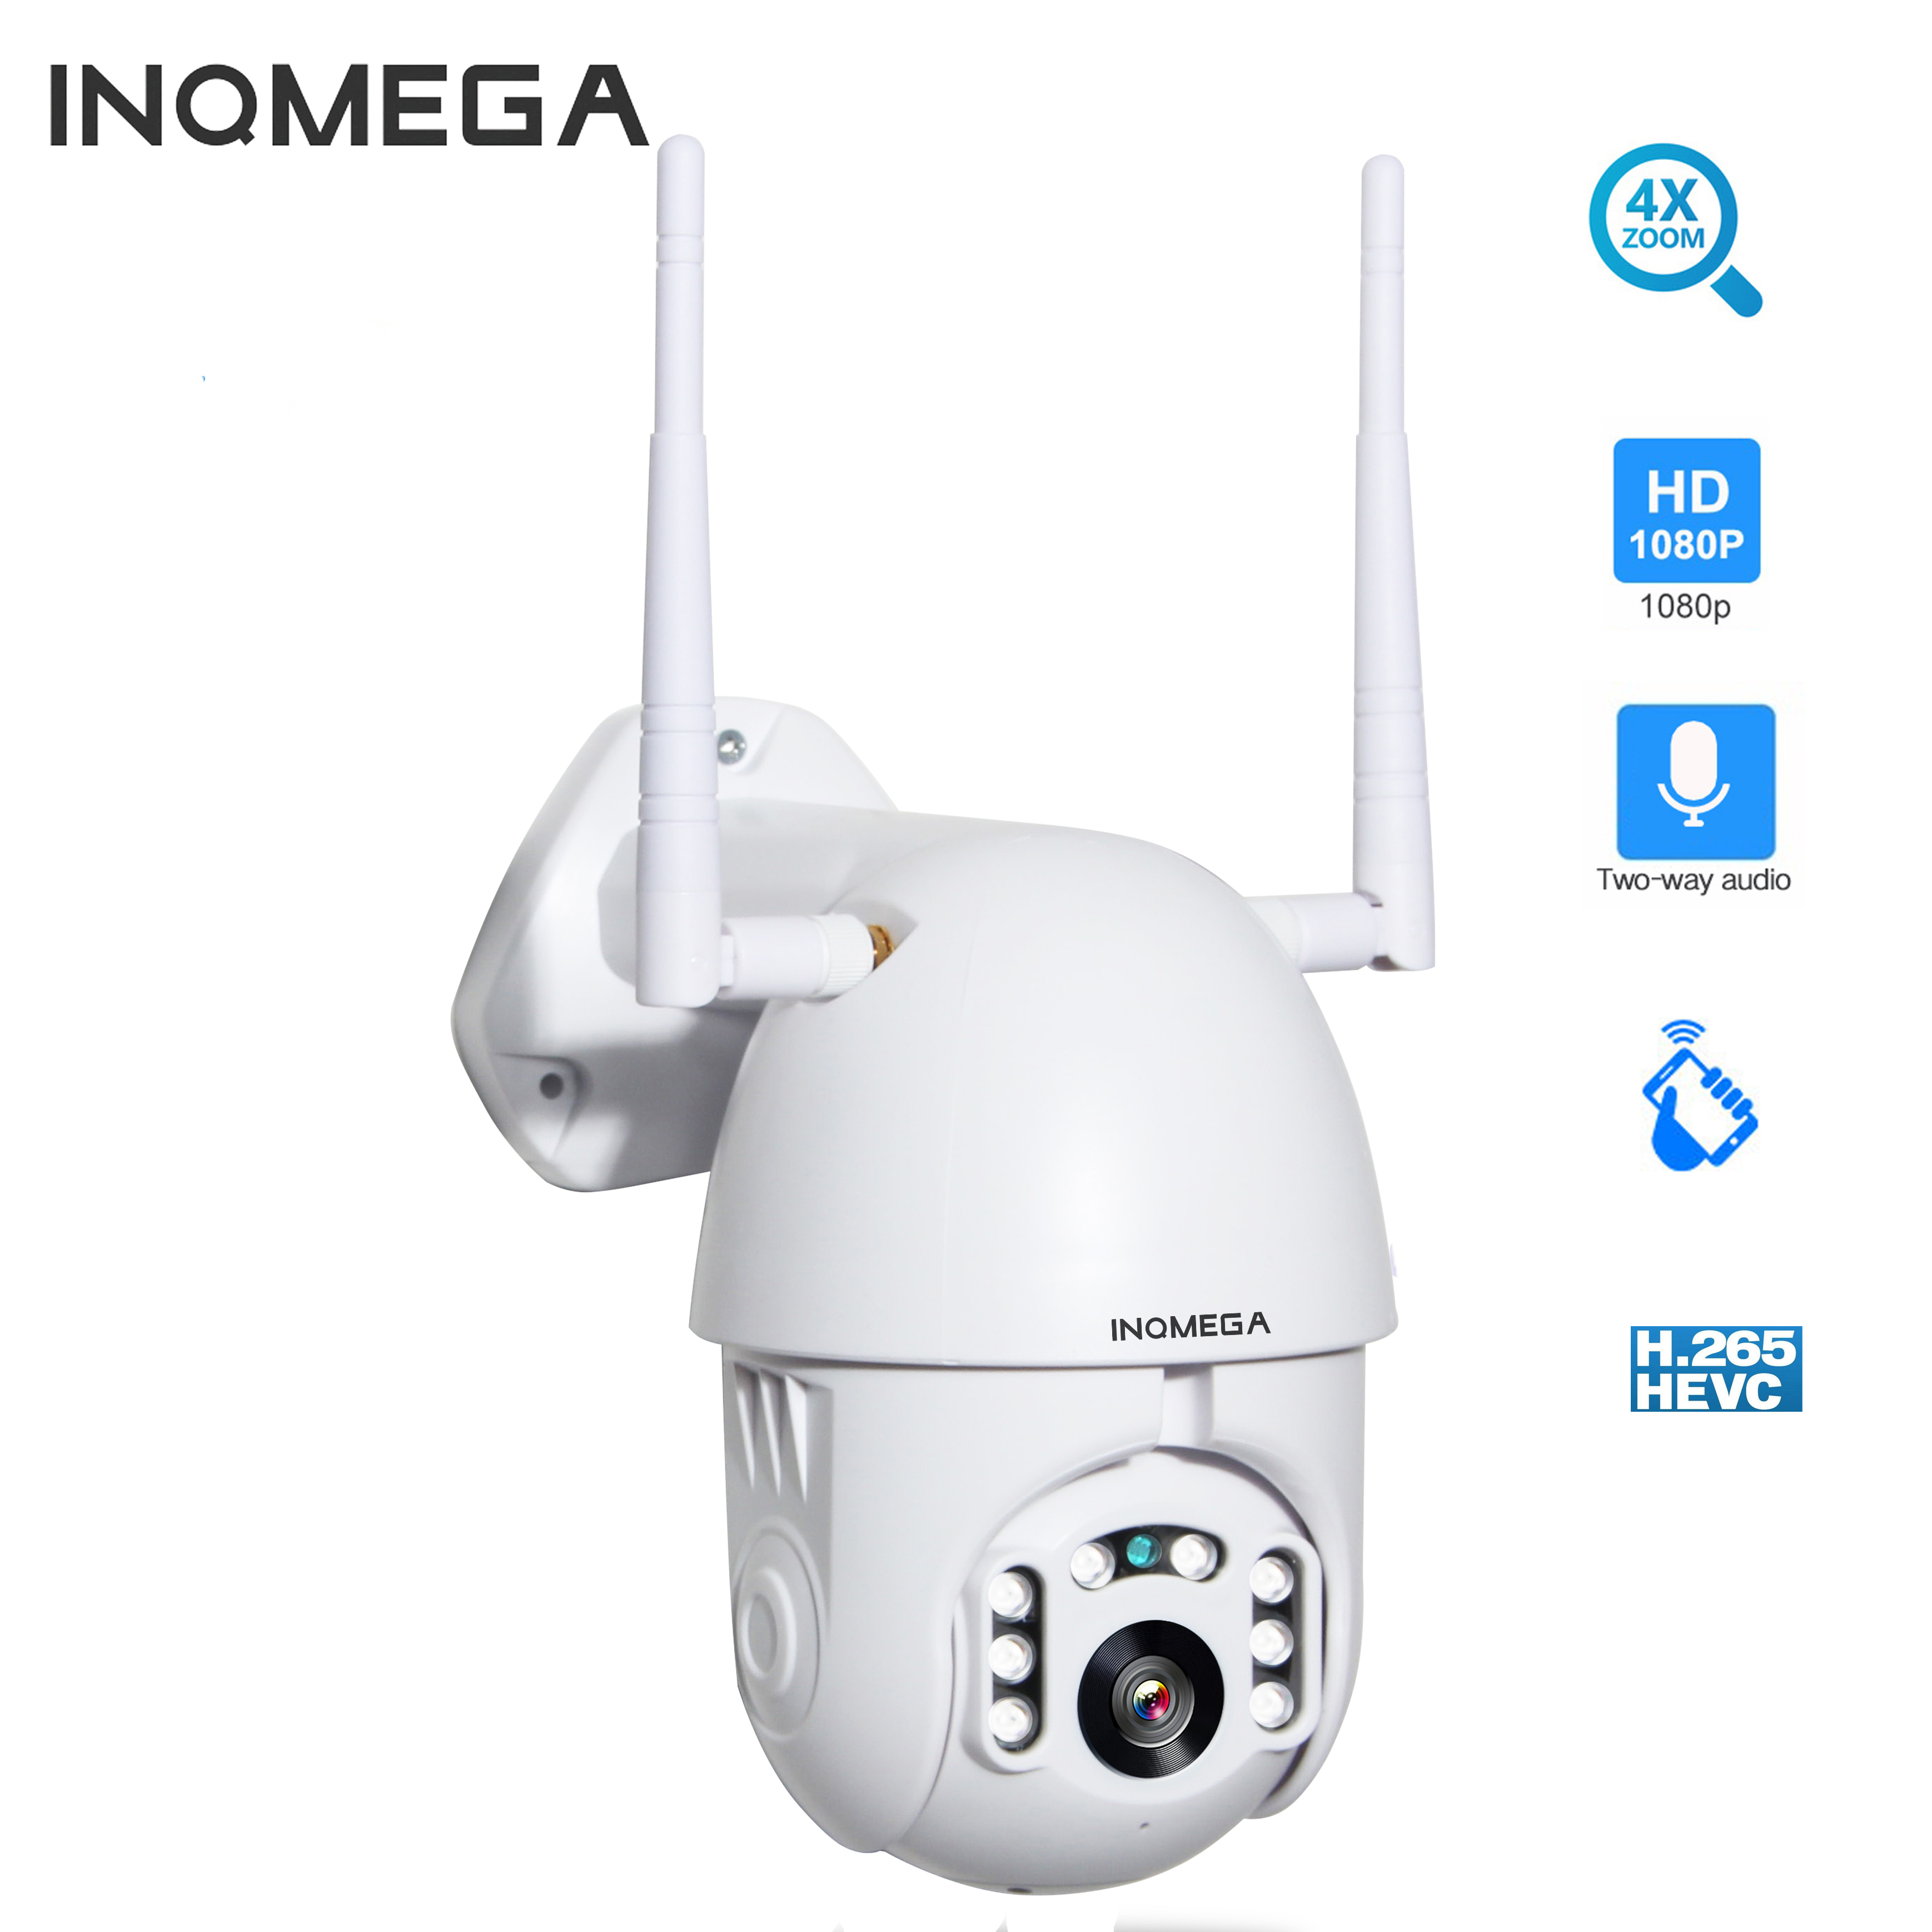 INQMEGA IP Camera Outdoor  4X Digital Zoom 1080p PTZ Speed Dome CCTV Security Cameras WIFI Exterior IR Home Surveilance Kamera